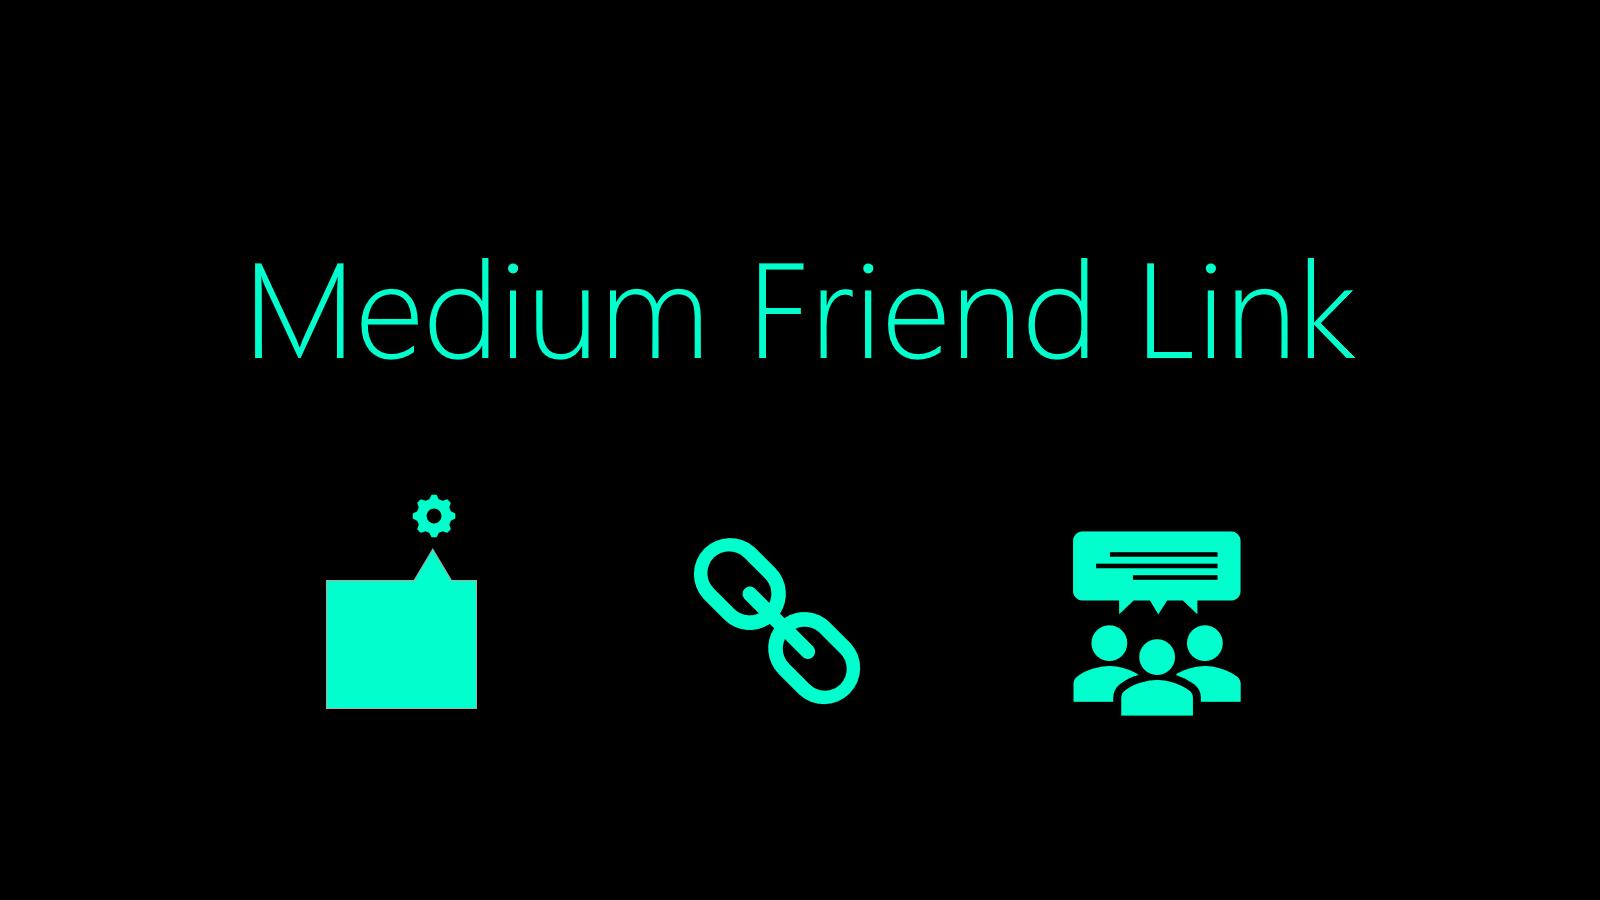 medium friend link, friend link, medium share link, medium friend share, medium share article anyone, medium friend links